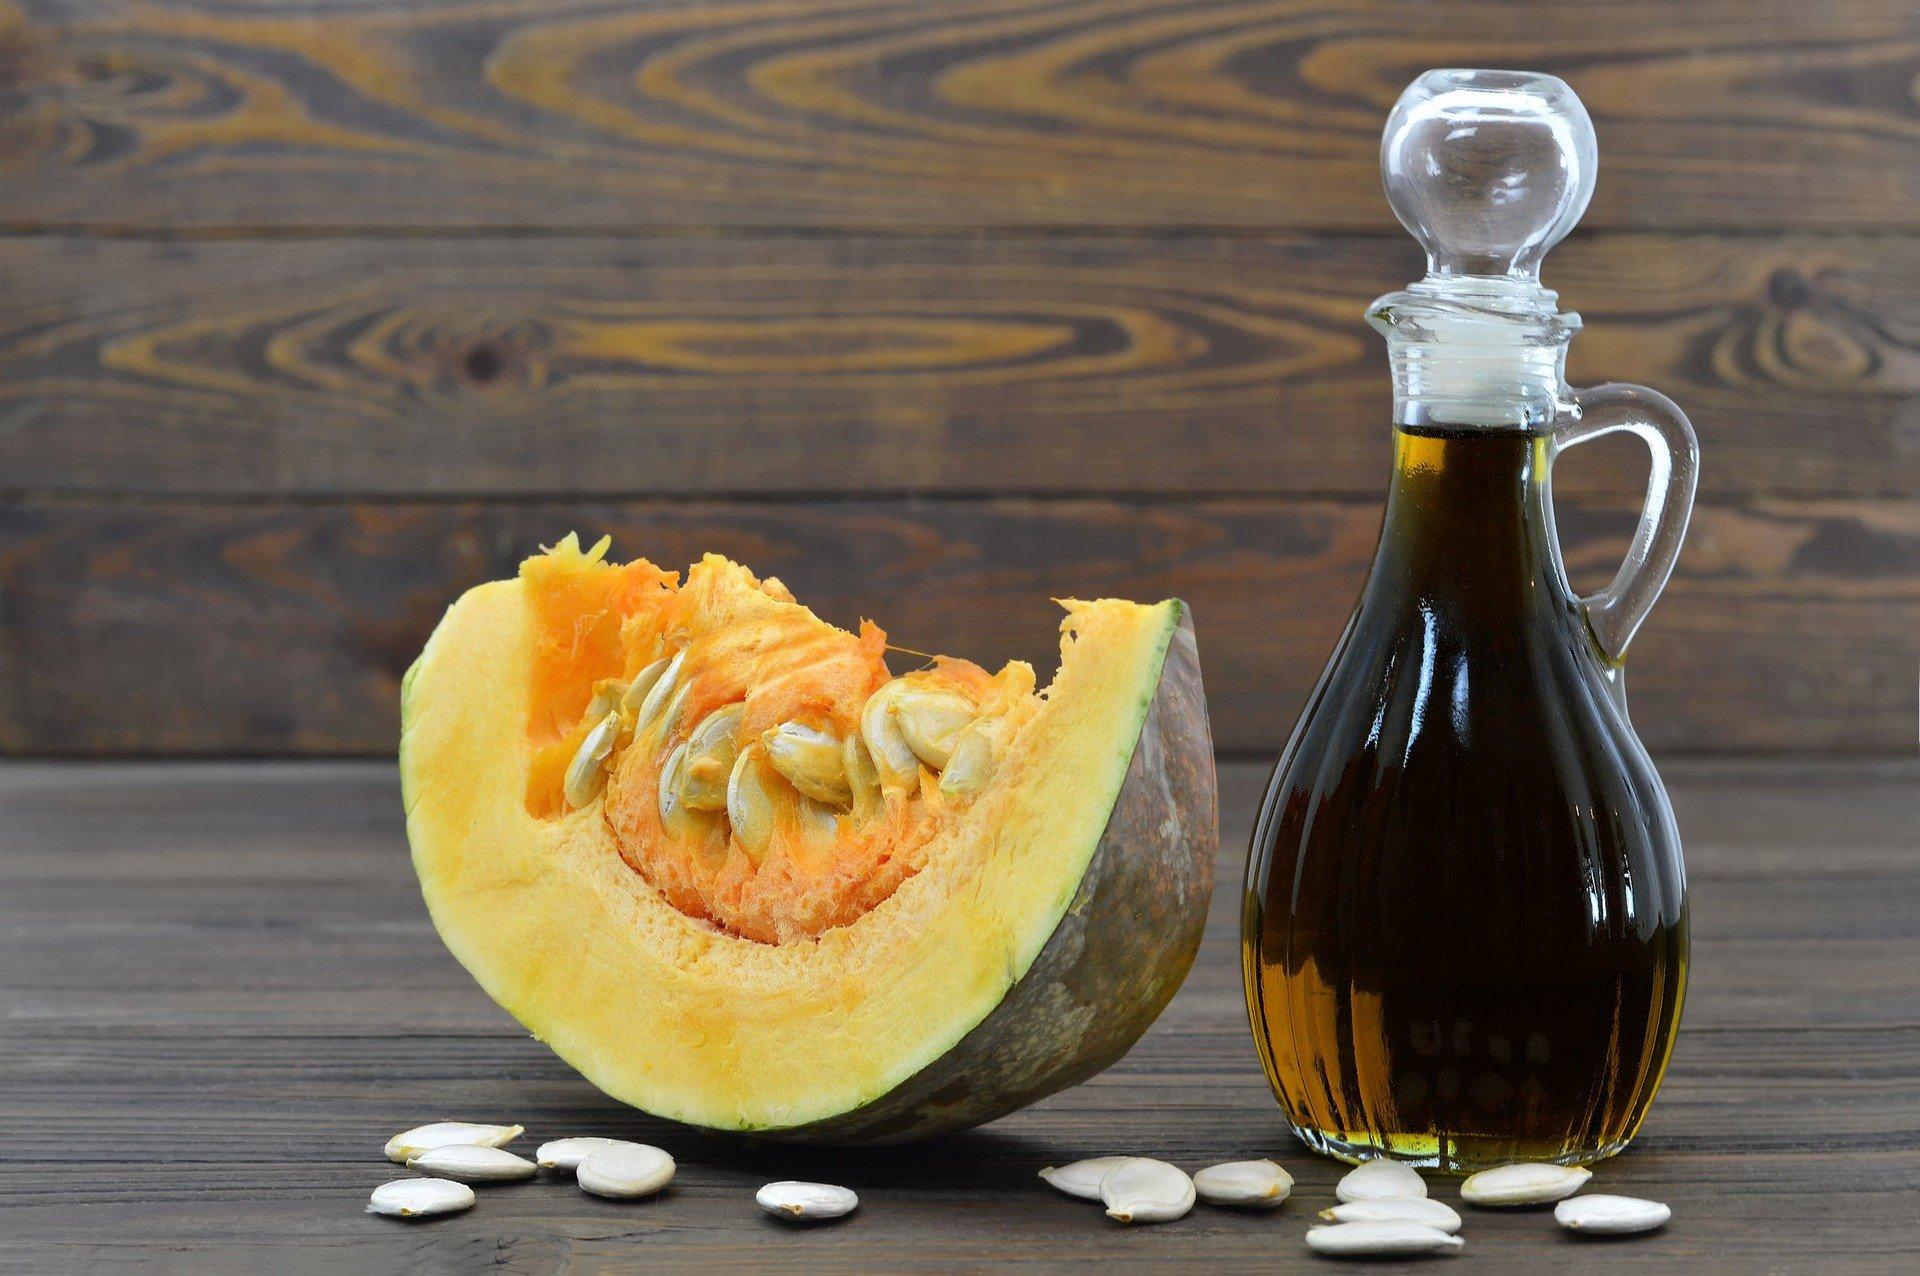 olej z pestek dyni skutki uboczne